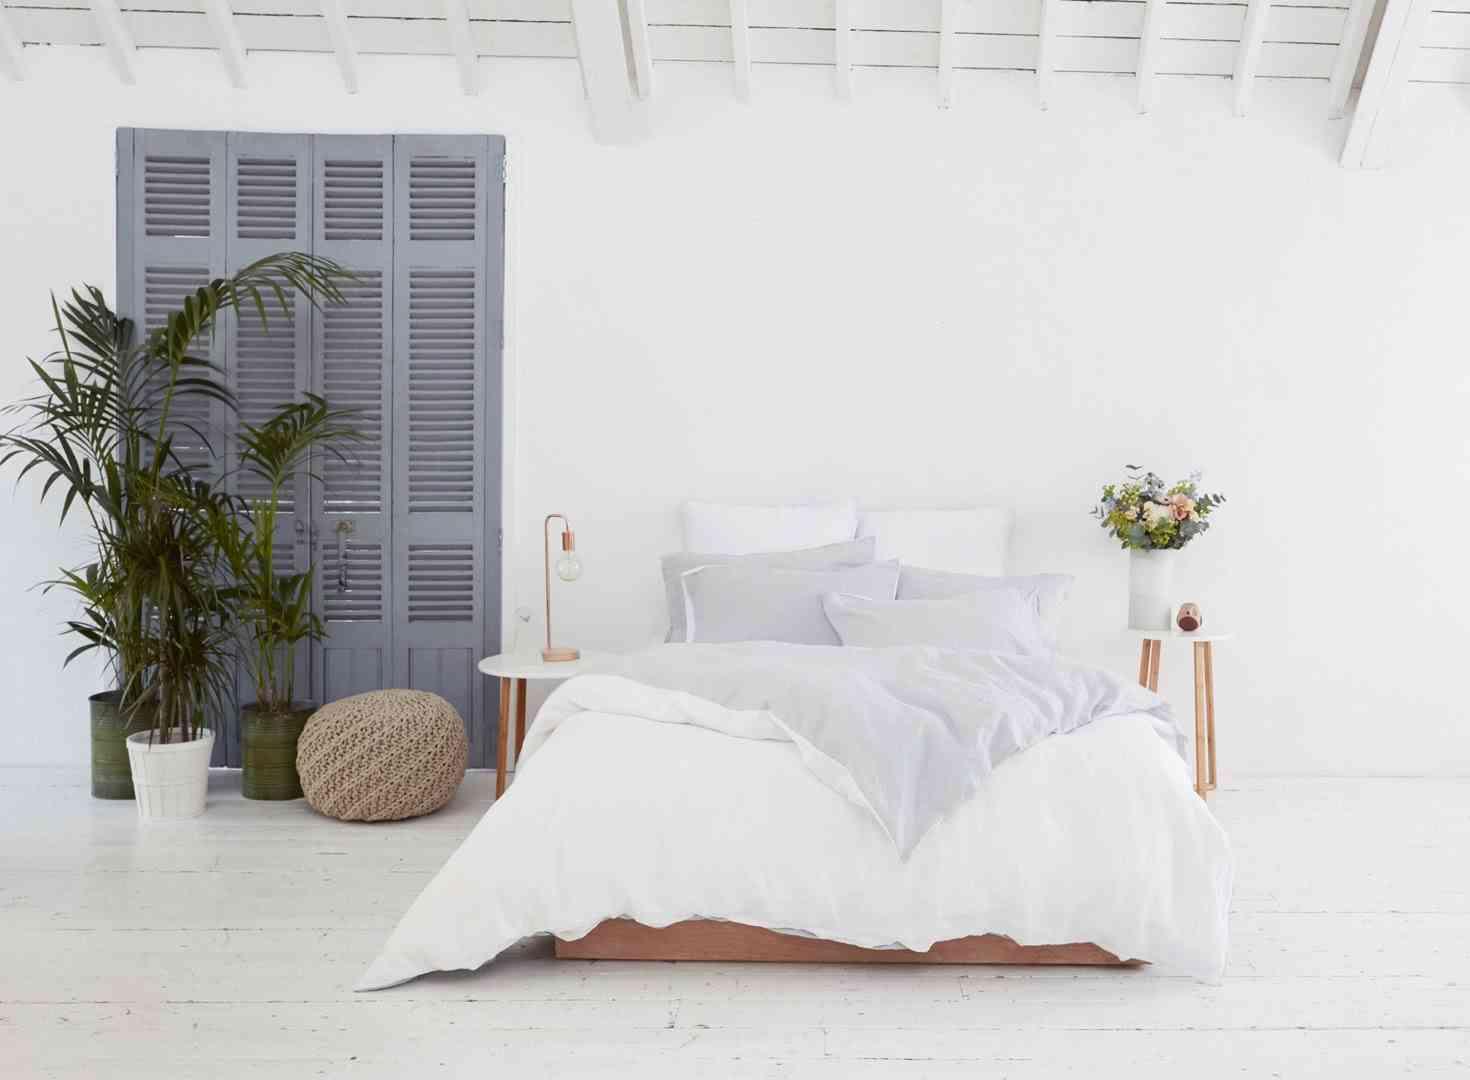 7 claves para renovar tu dormitorio con éxito este 2018 3